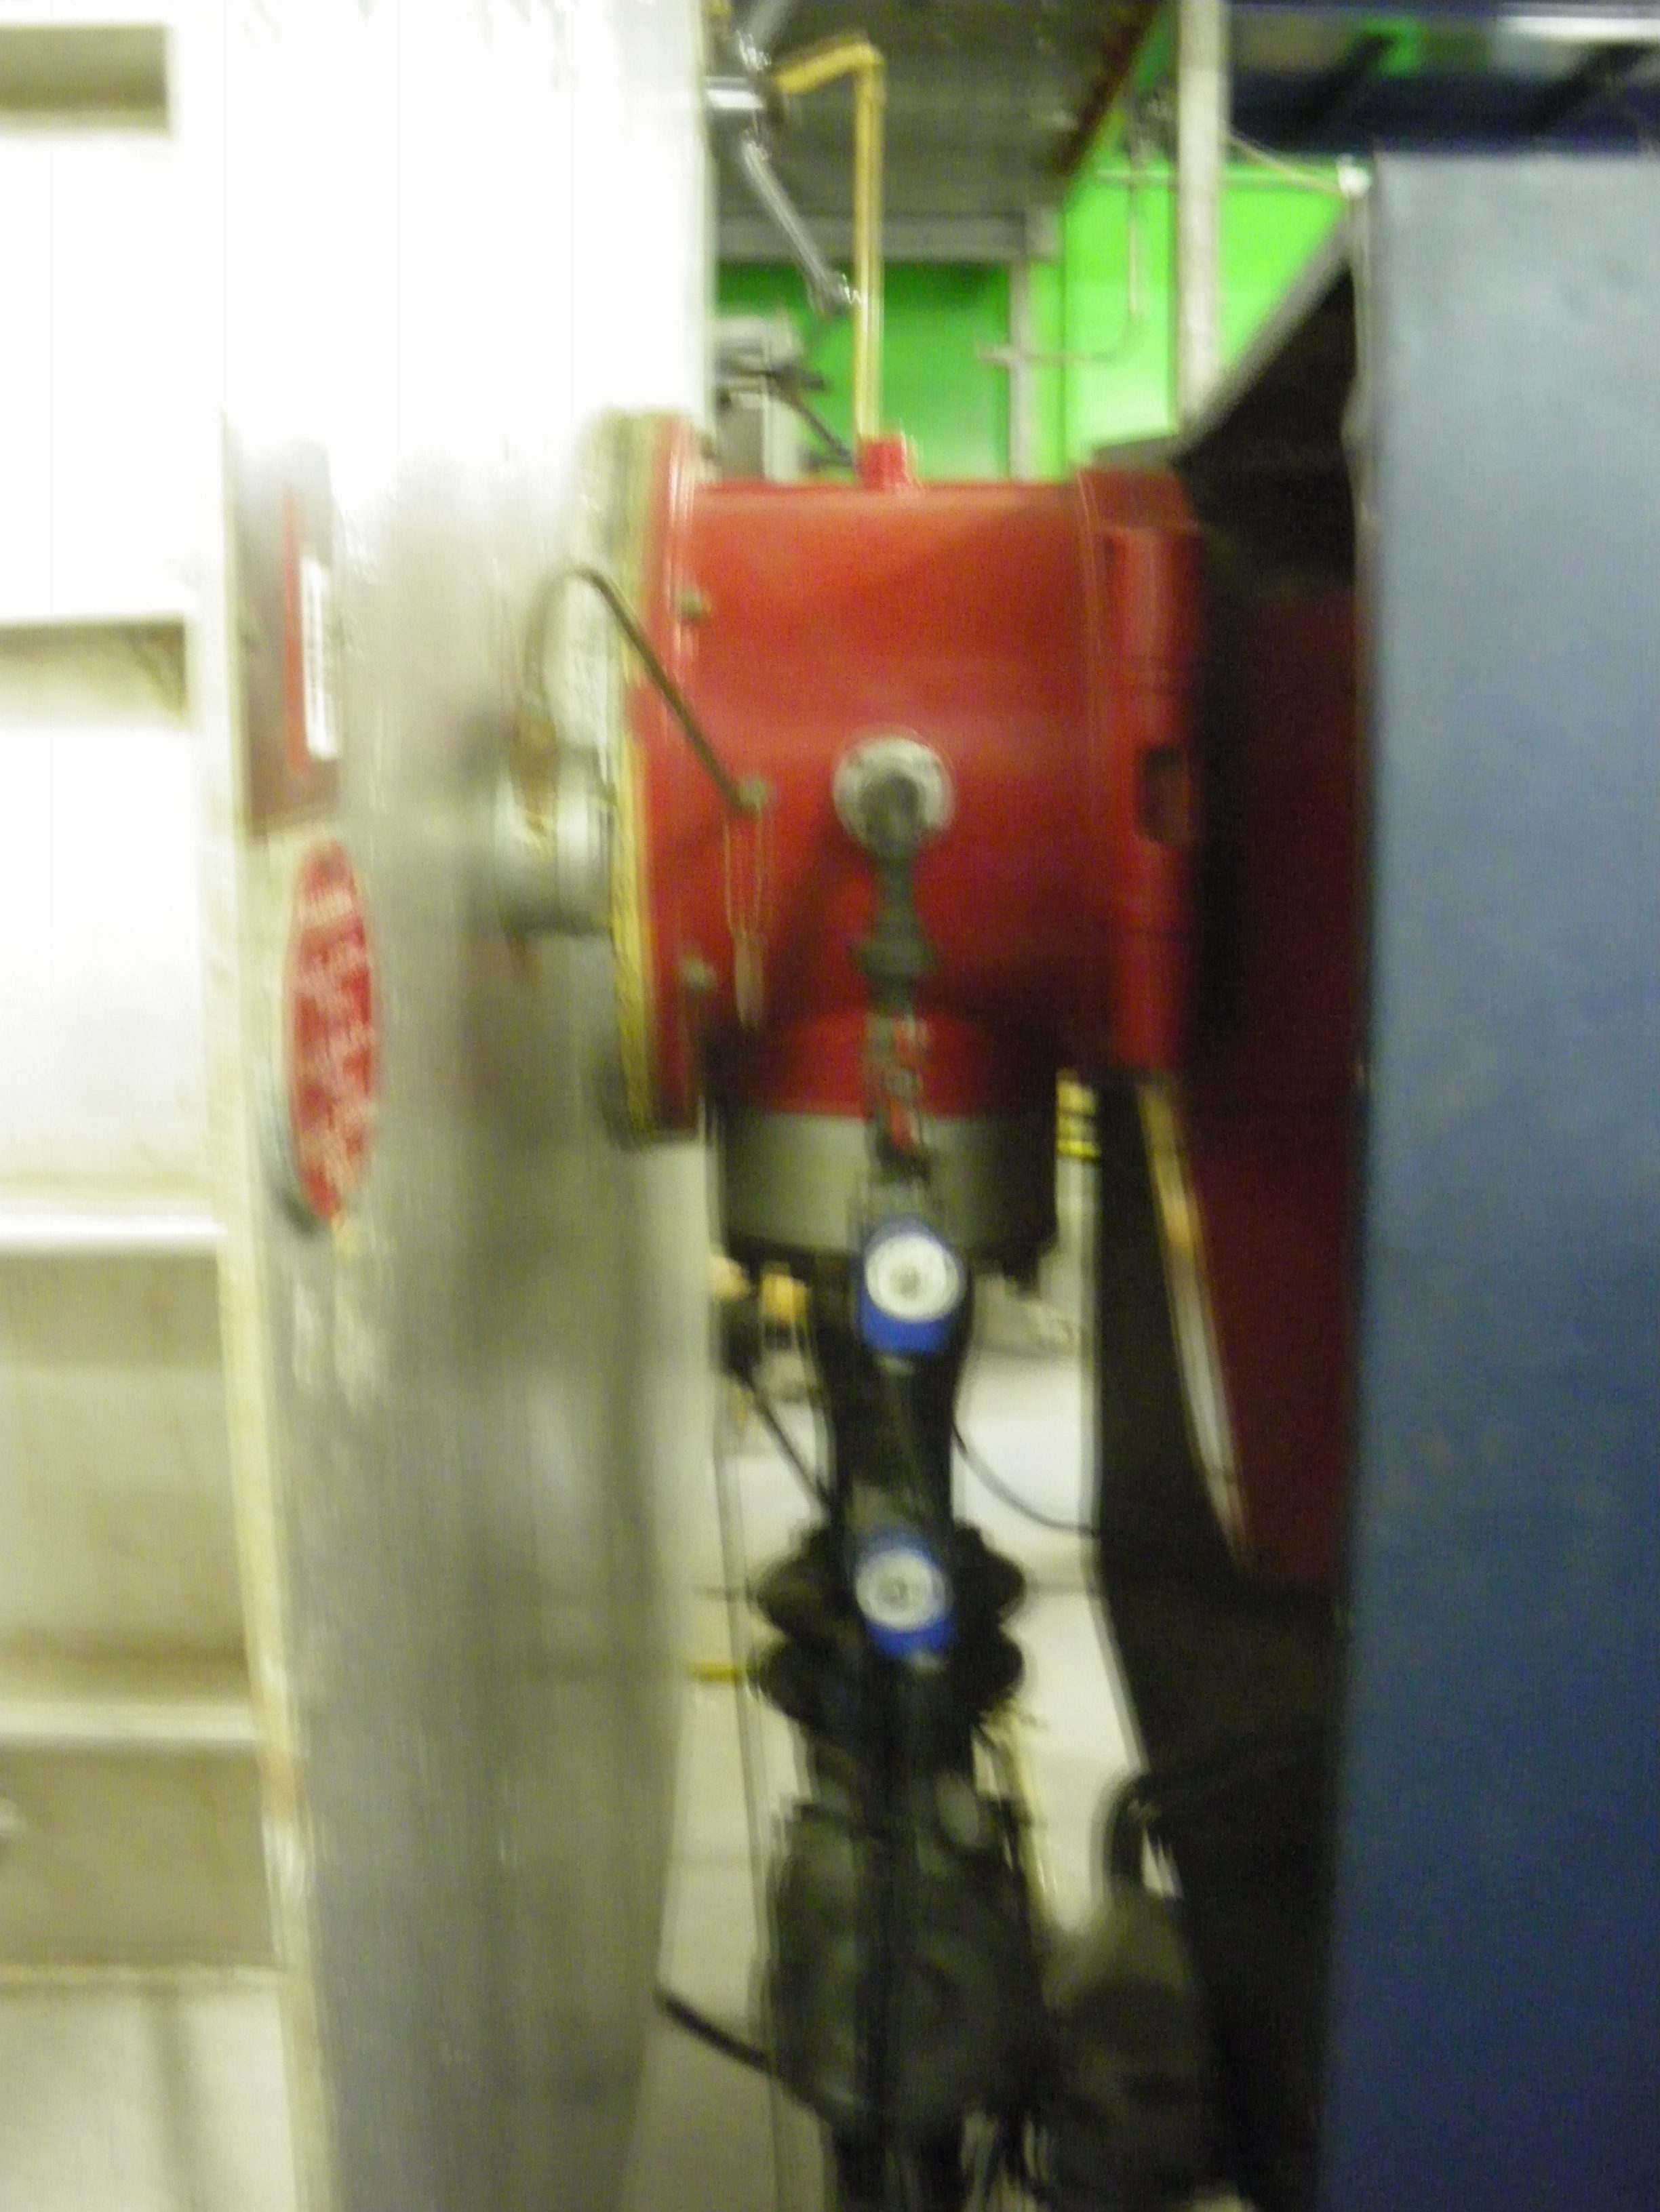 Weishaupt Boiler gas burner.